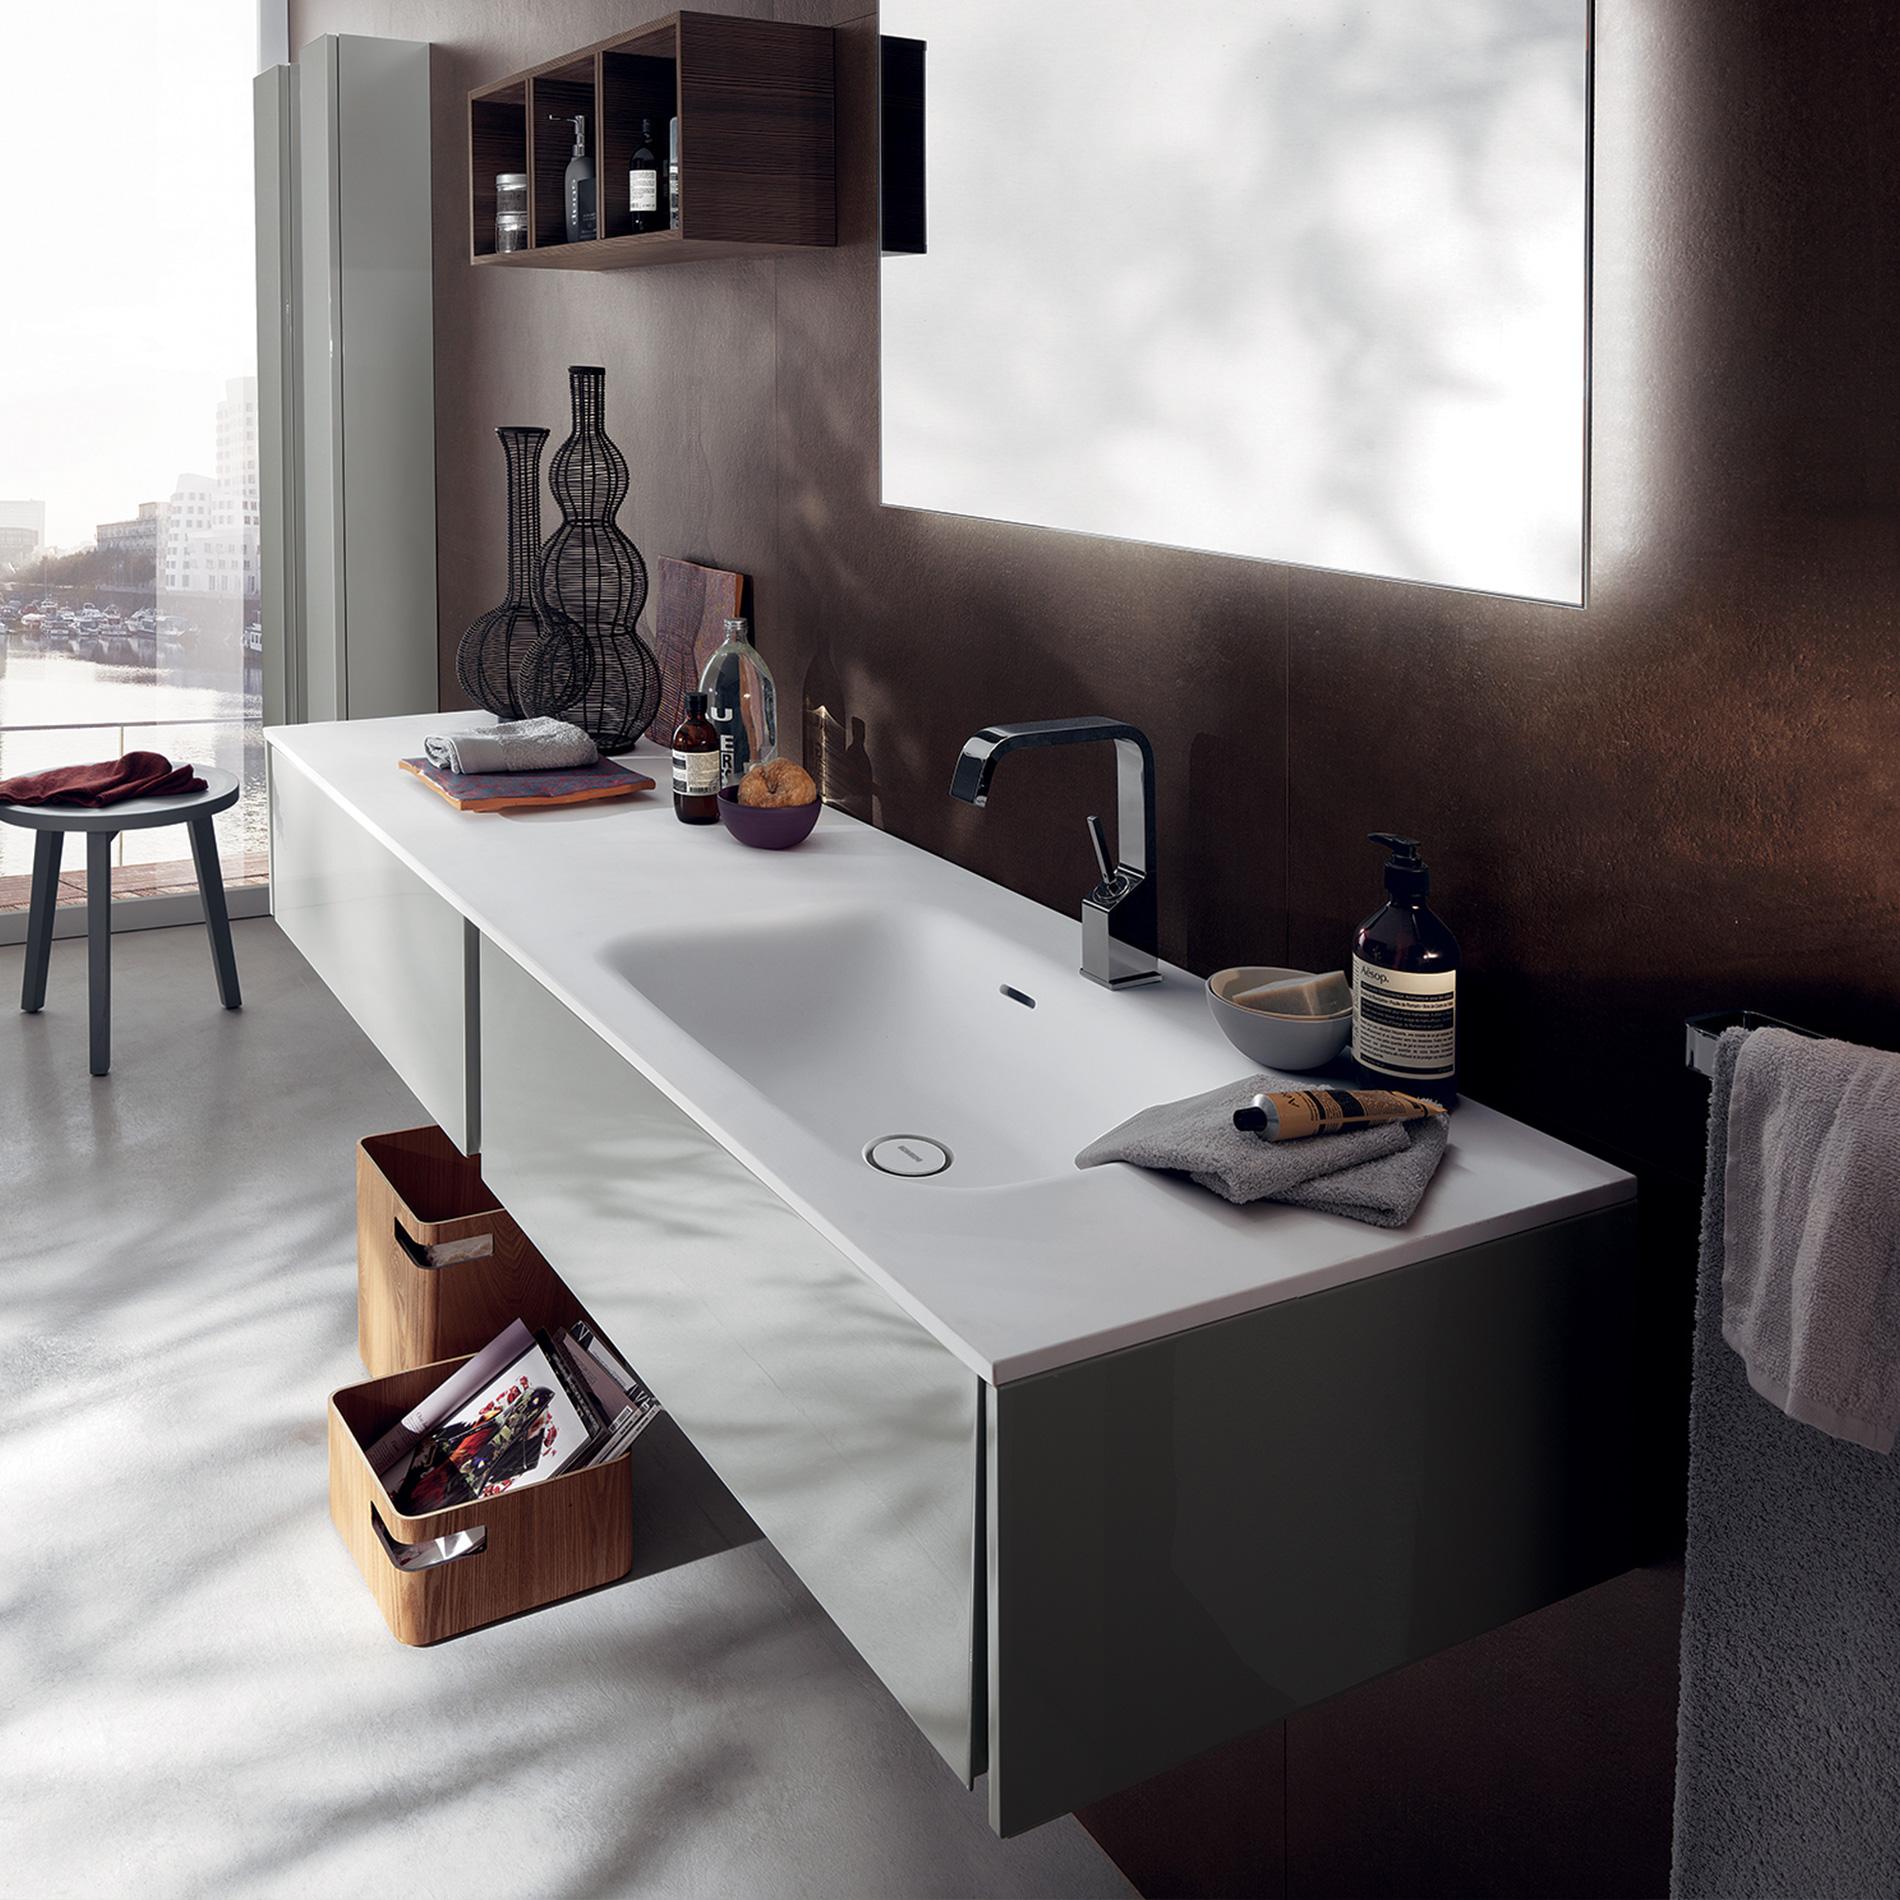 Nicos-International-home-products-Scavolini-washbasins-1